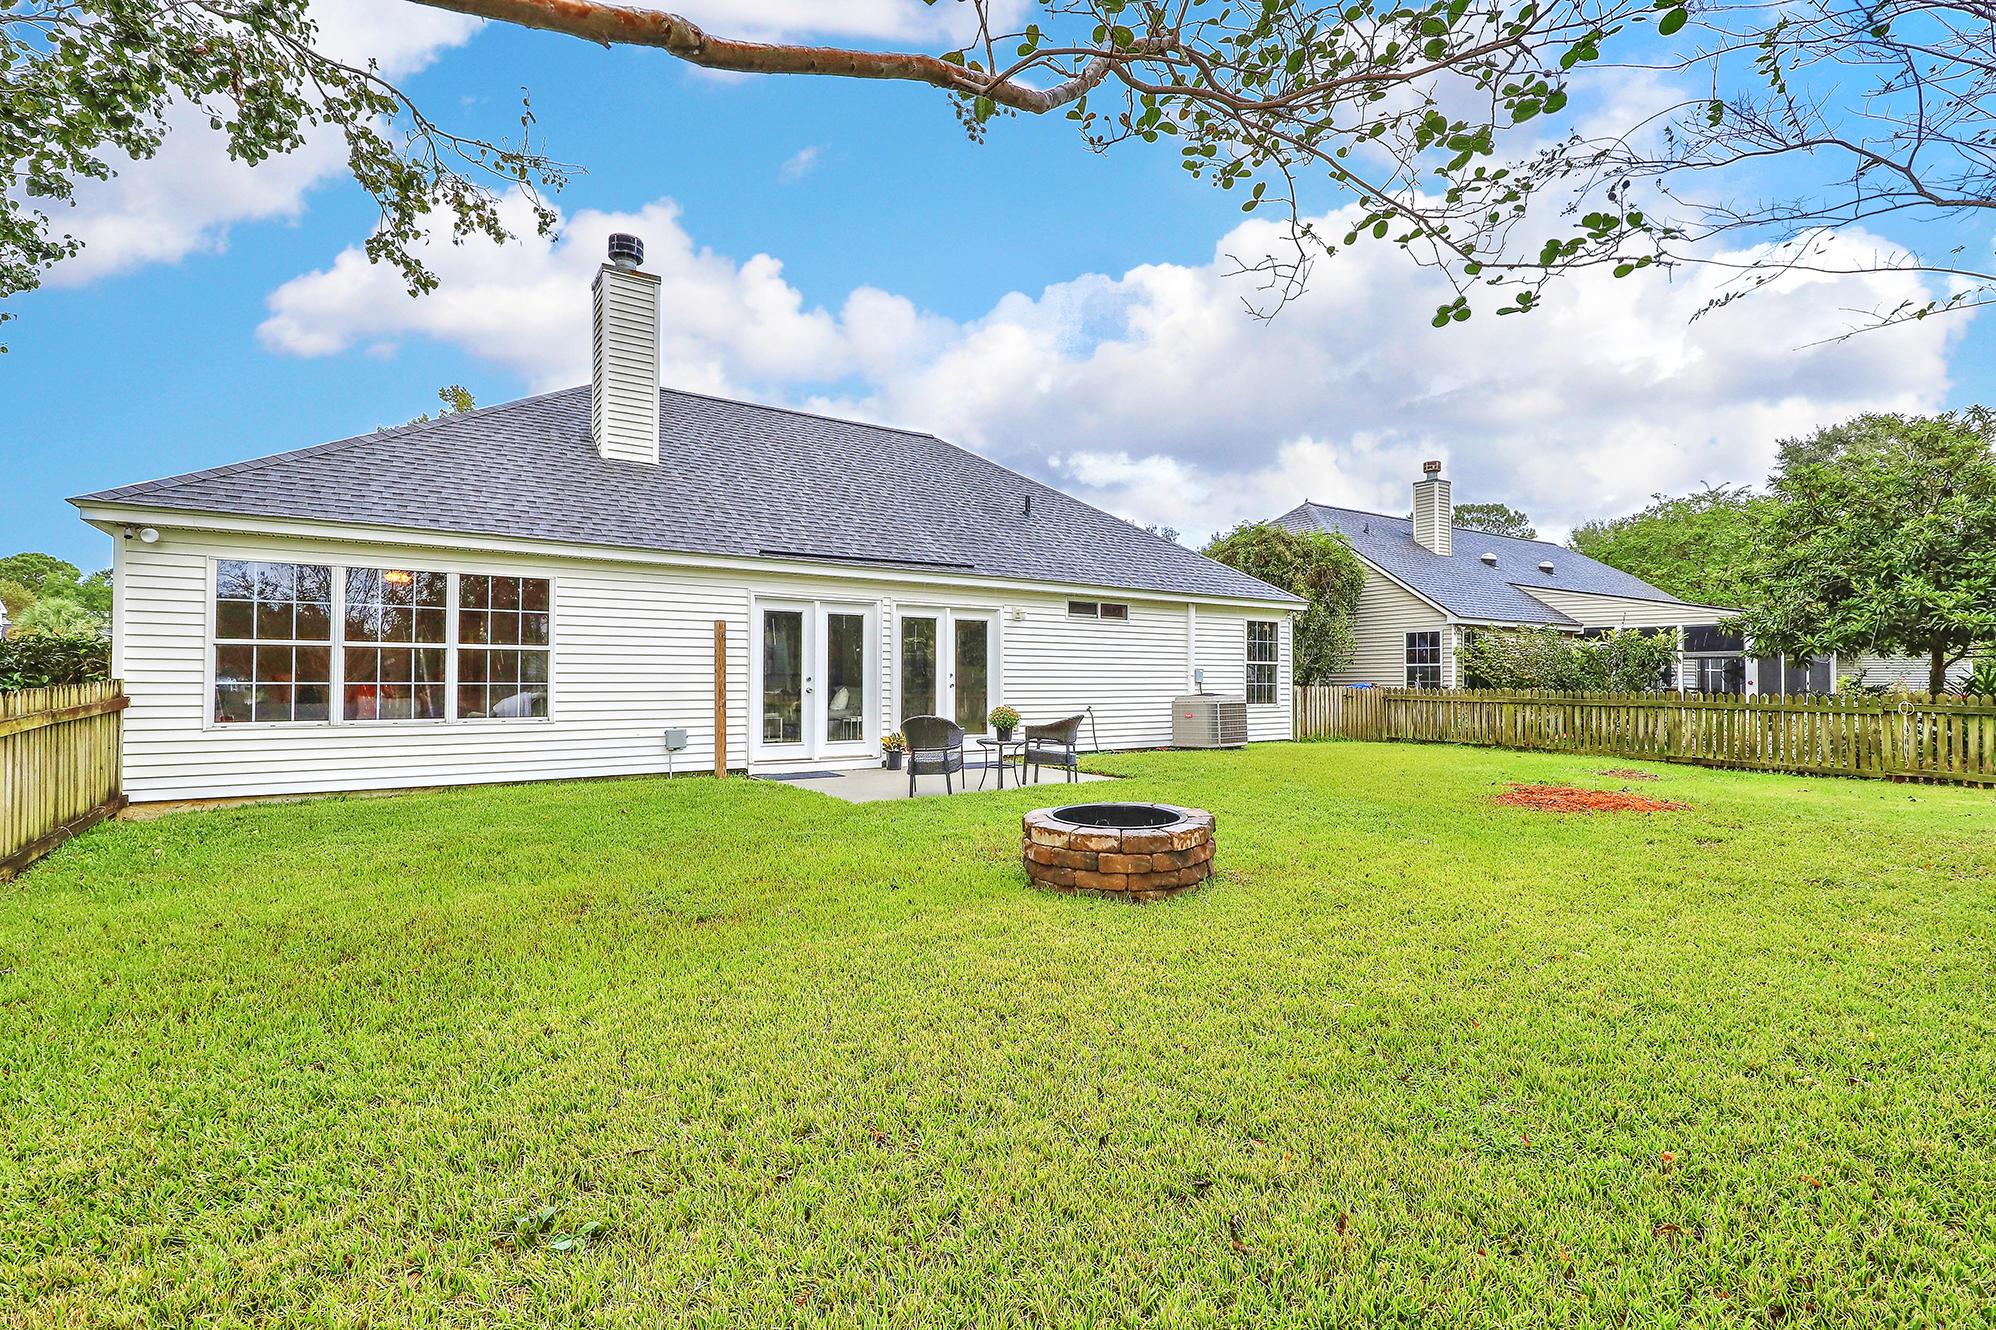 Planters Pointe Homes For Sale - 2951 Loebs, Mount Pleasant, SC - 28